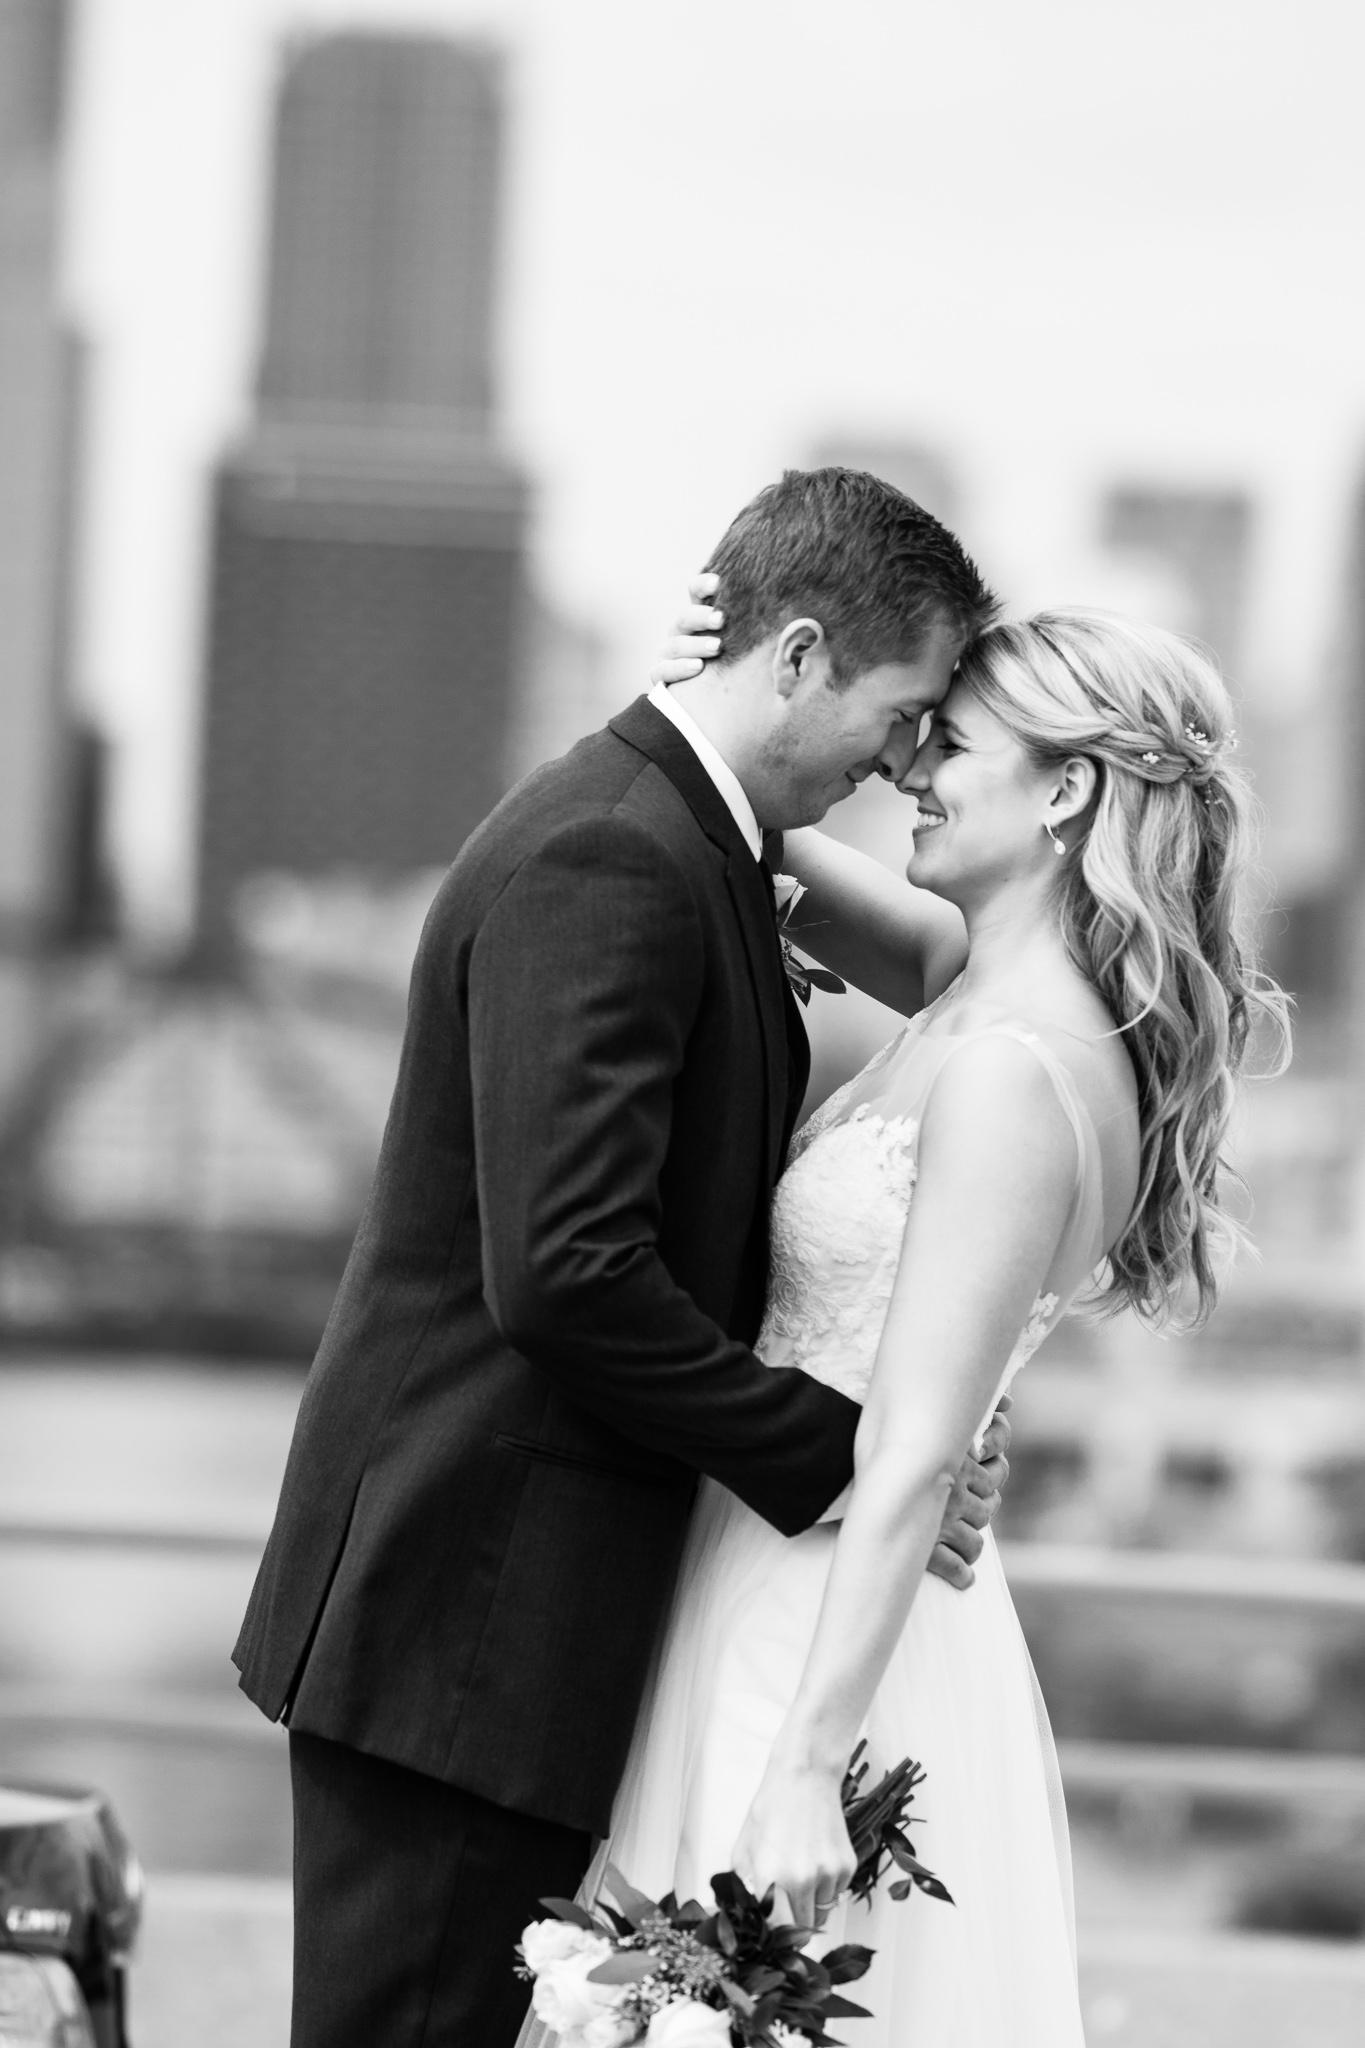 bridgeport-art-center-wedding-photos-16.jpg